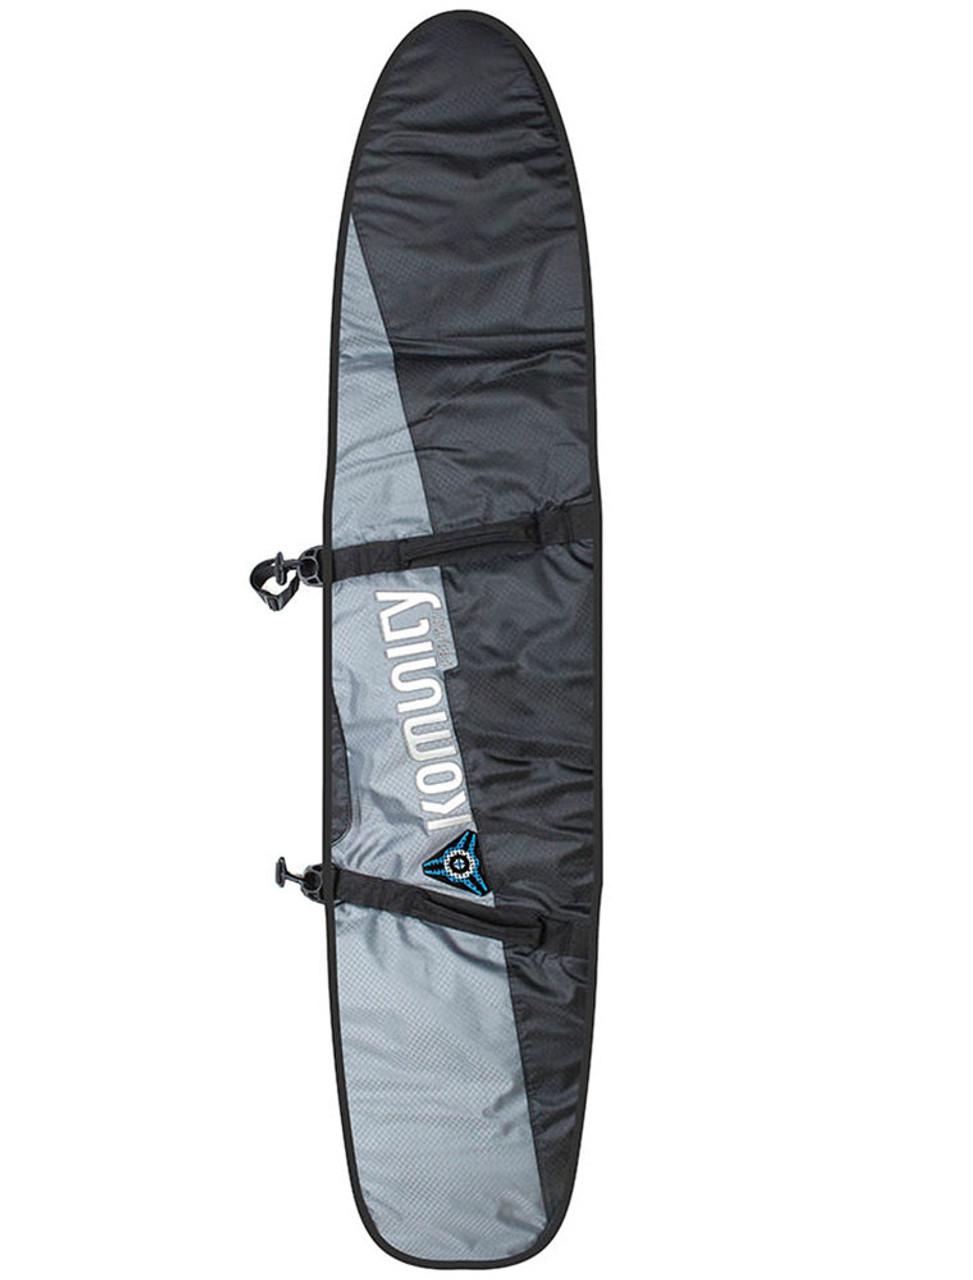 longboard surfboard travel bag for airplane